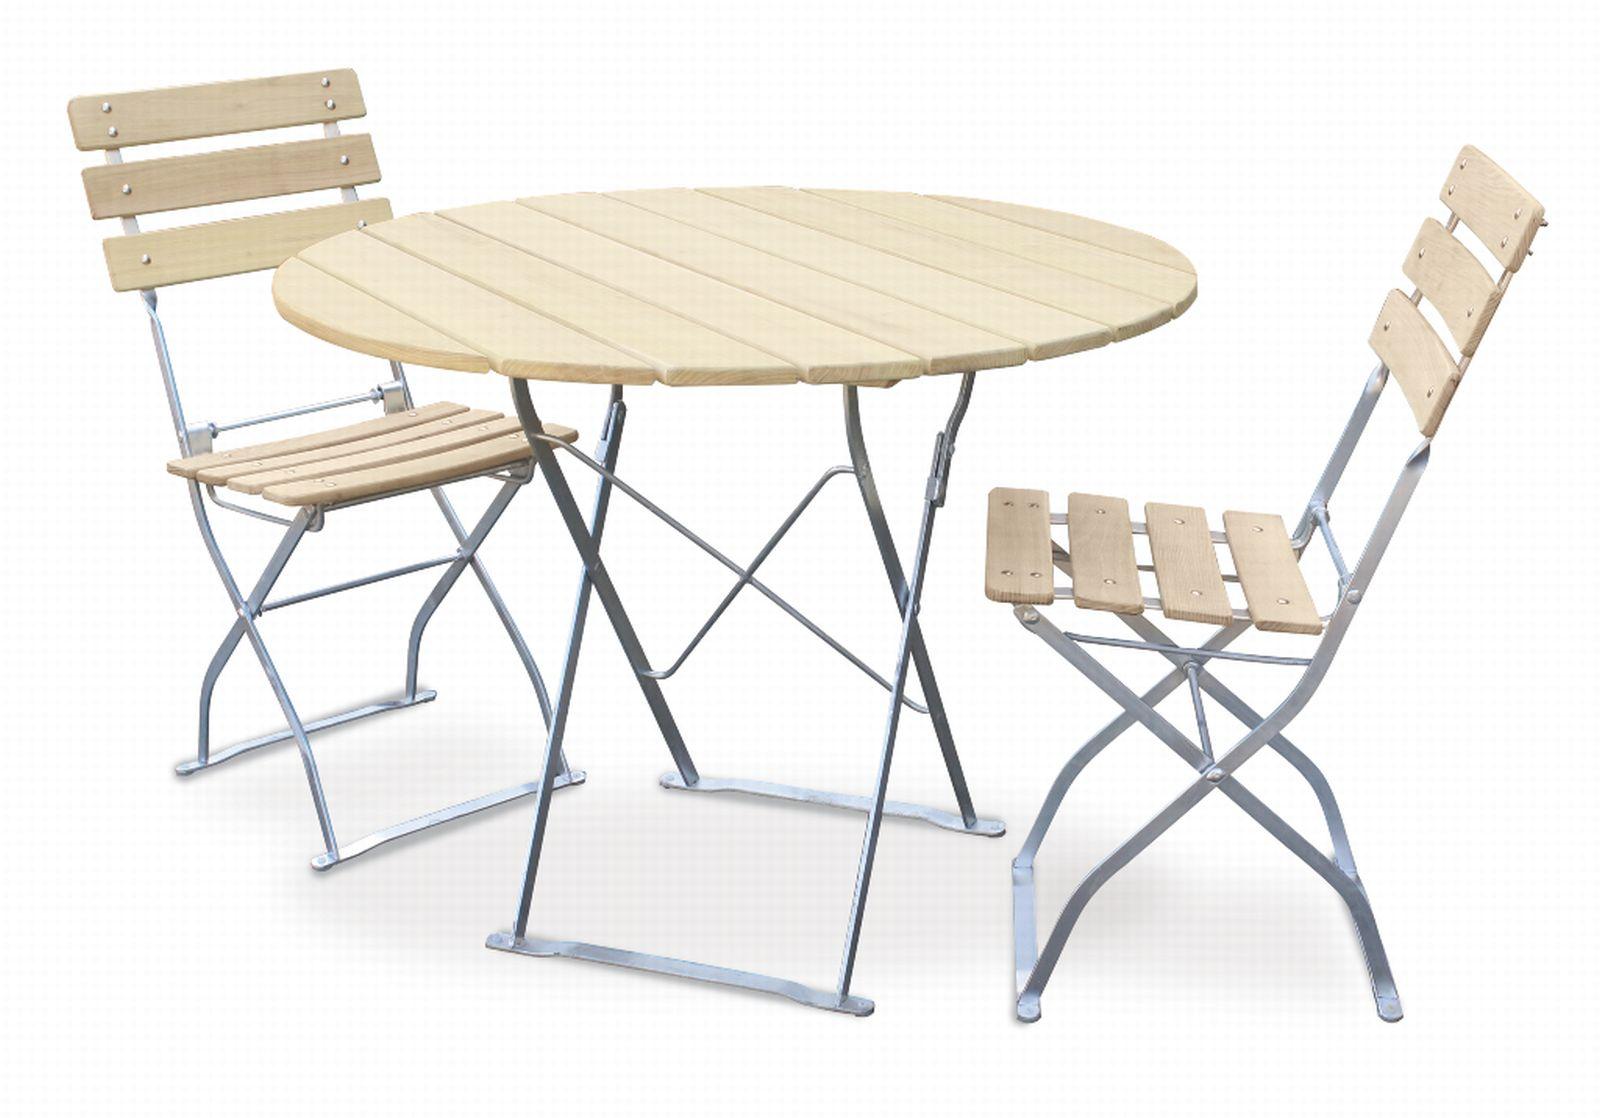 EuroLiving-Biergartengarnitur-Edition-Natur-1x-Tisch-Ø100-2x-Stuhl